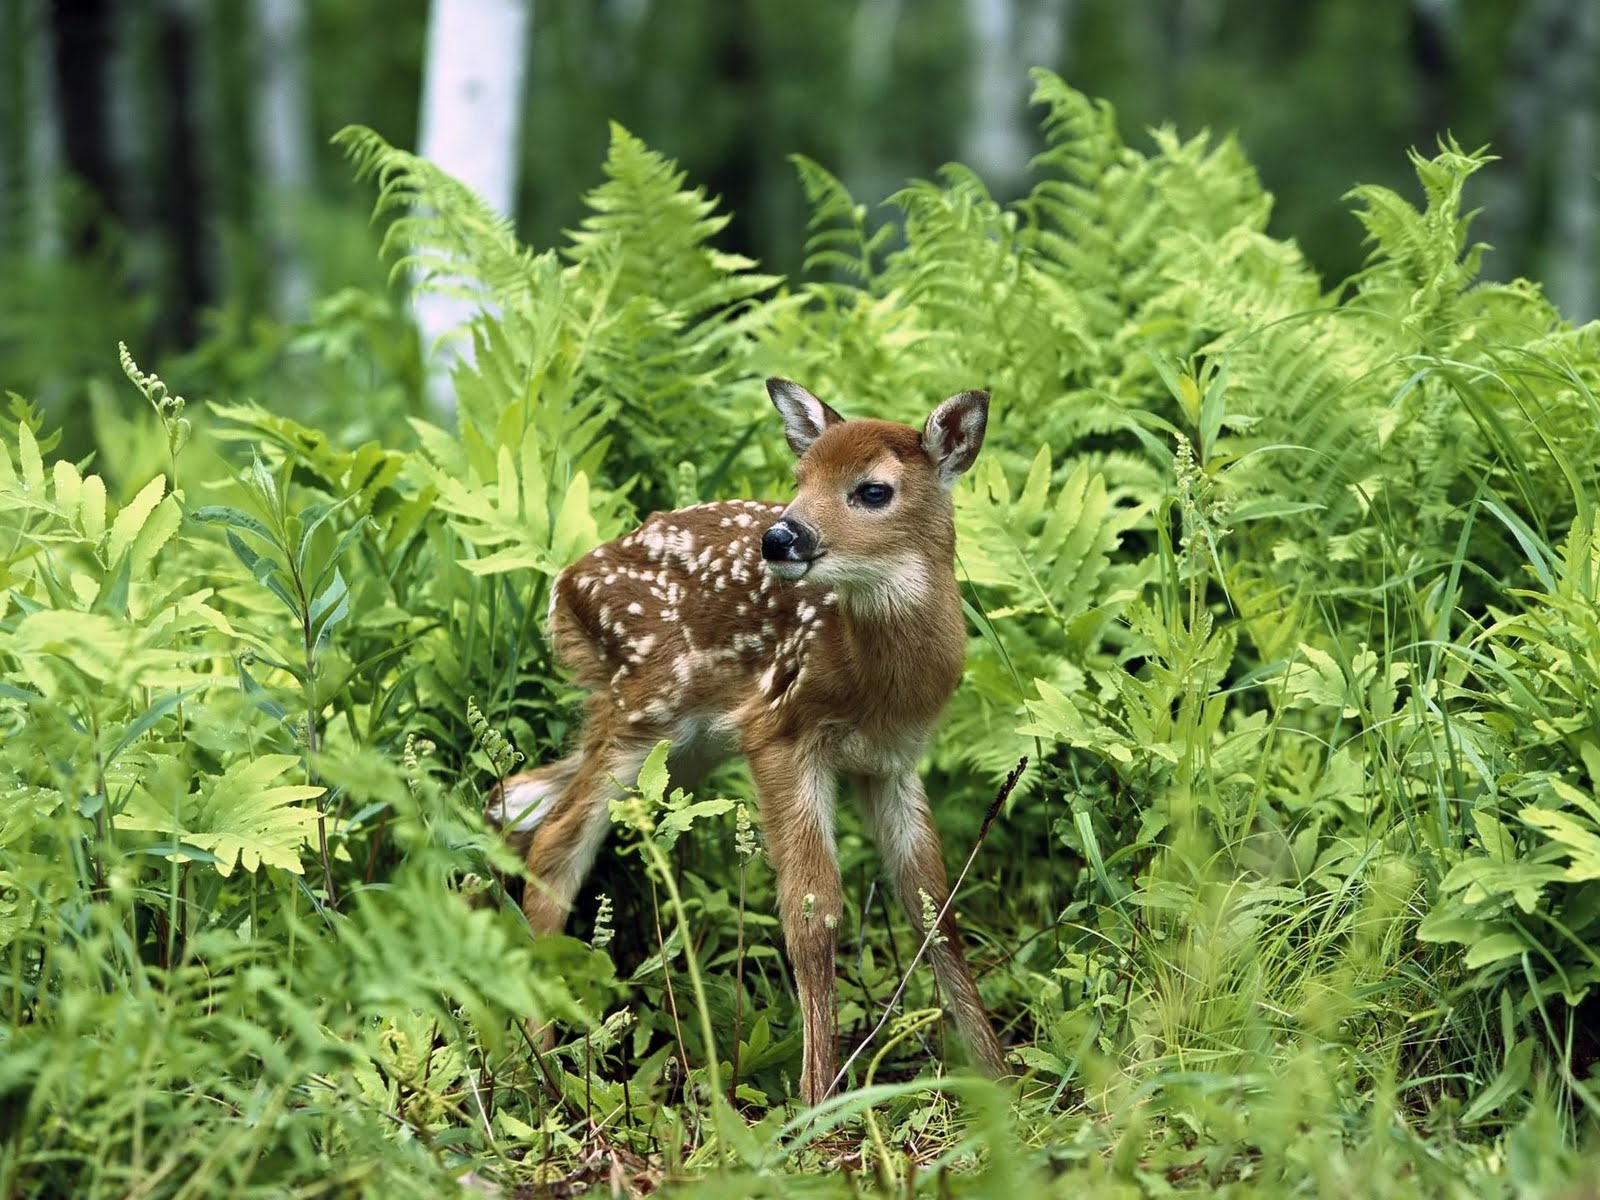 http://1.bp.blogspot.com/-LnprUj7R2FE/Td3vBGbBcwI/AAAAAAAAAww/eYDvVP7J05w/s1600/Newborn_chital_deer_%2528spotted_deer%252C_axis_deer%2529.jpg